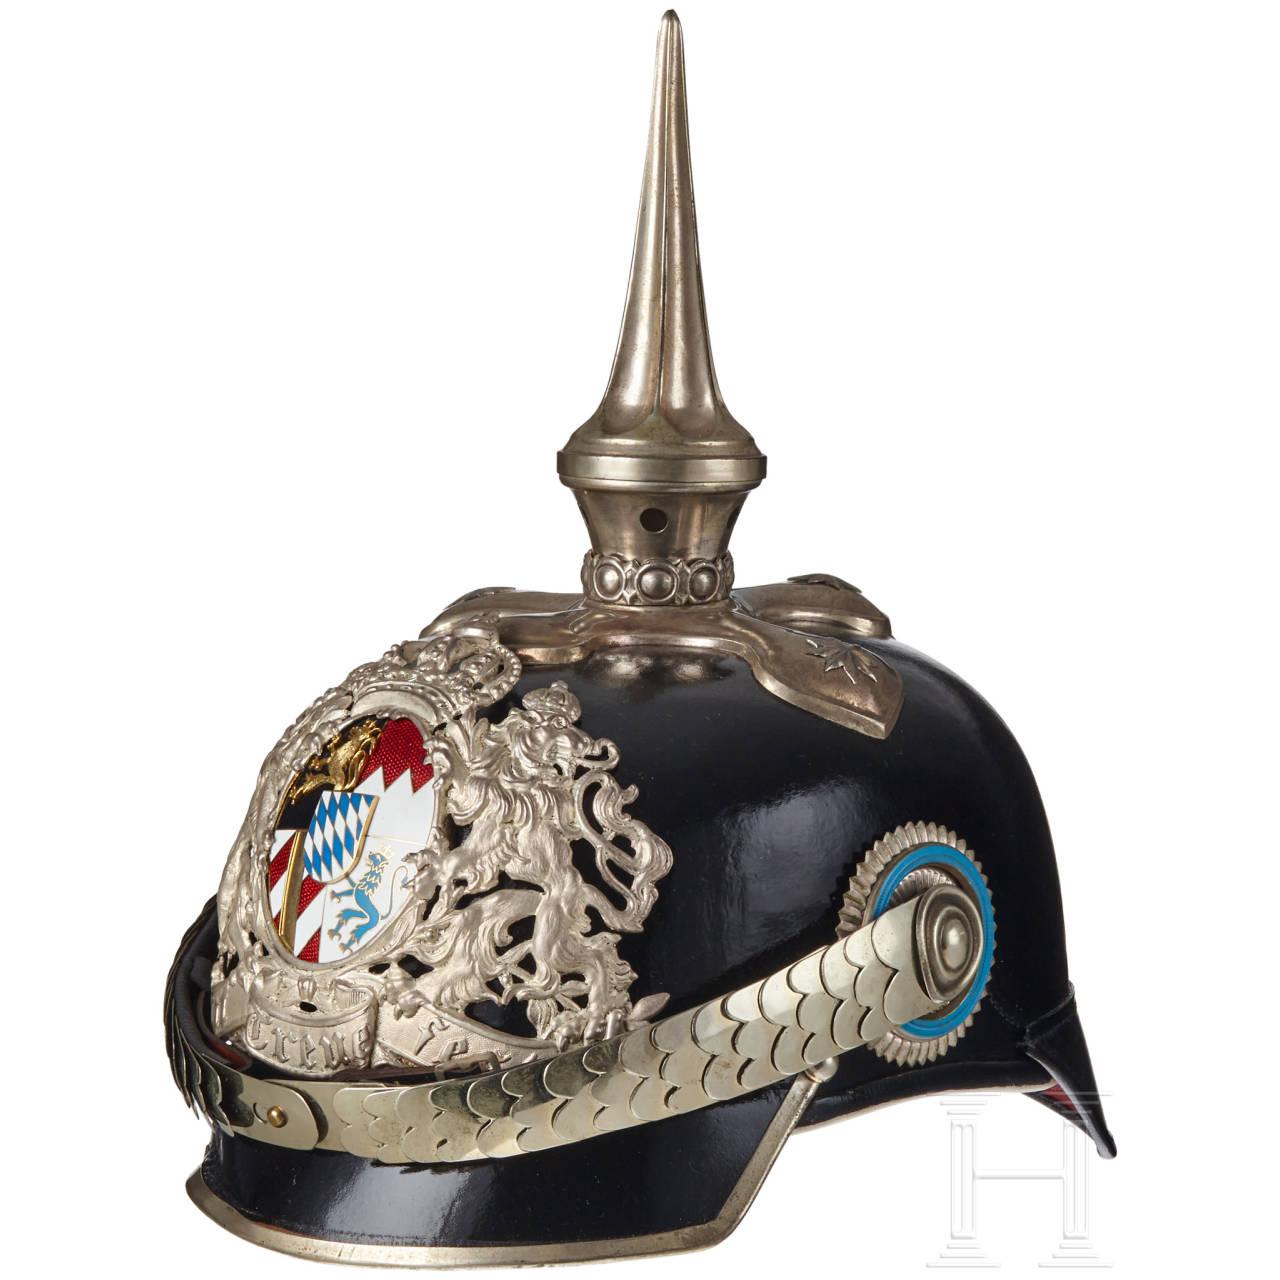 A Bavarian General Spiked Helmet